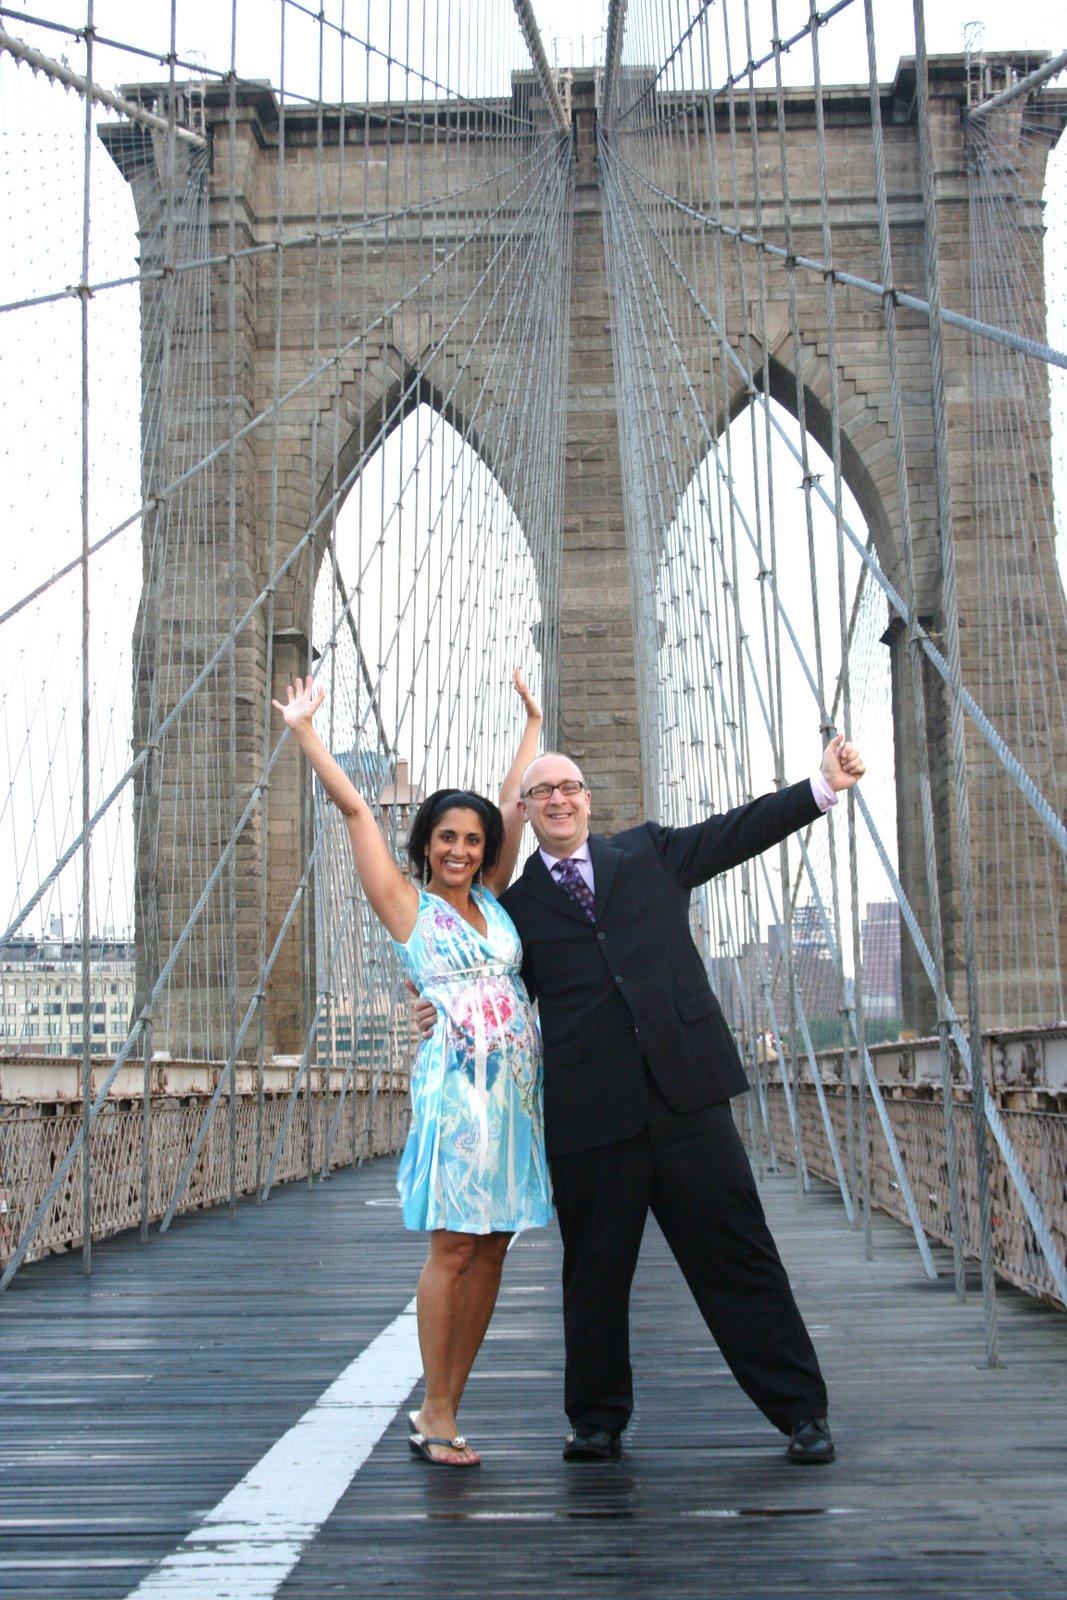 http://4.bp.blogspot.com/_Ot-687NUu2Q/Sbftzz1DYTI/AAAAAAAABd8/DYEPmYhqDac/s1600/Lyla+and+David+203.JPG